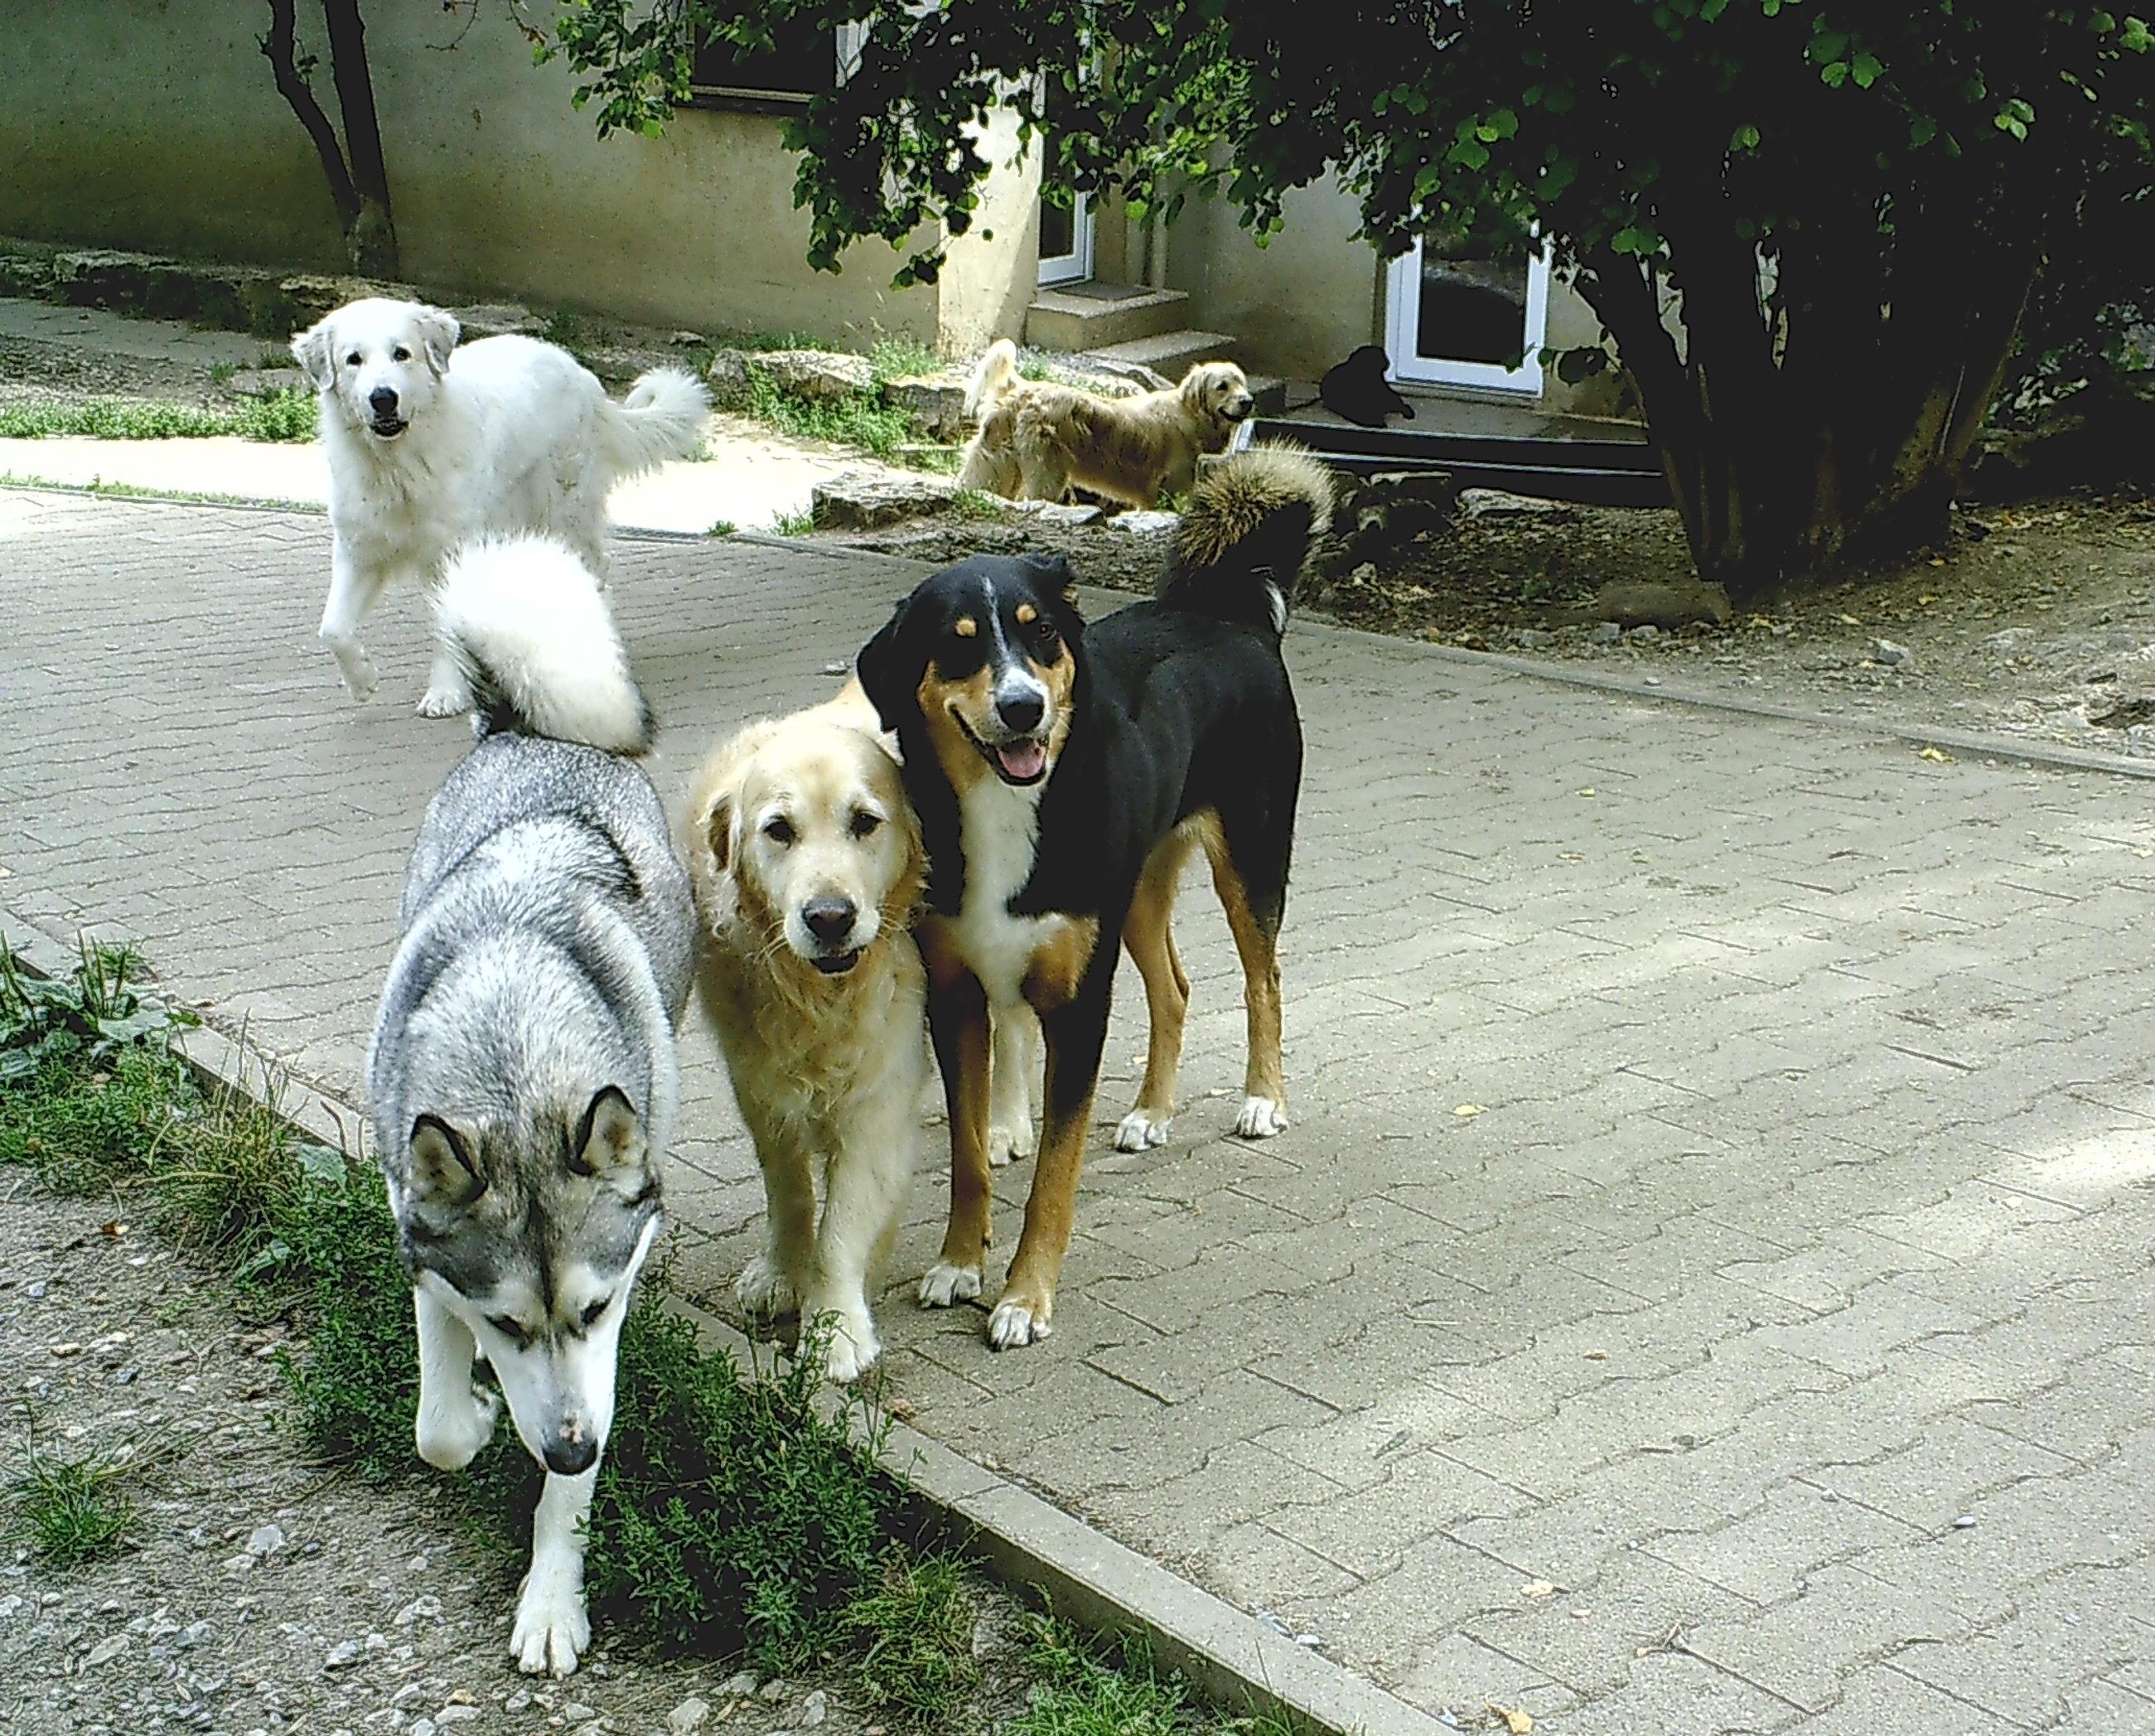 hundepension wuff aktuelles3 - Aktuelles